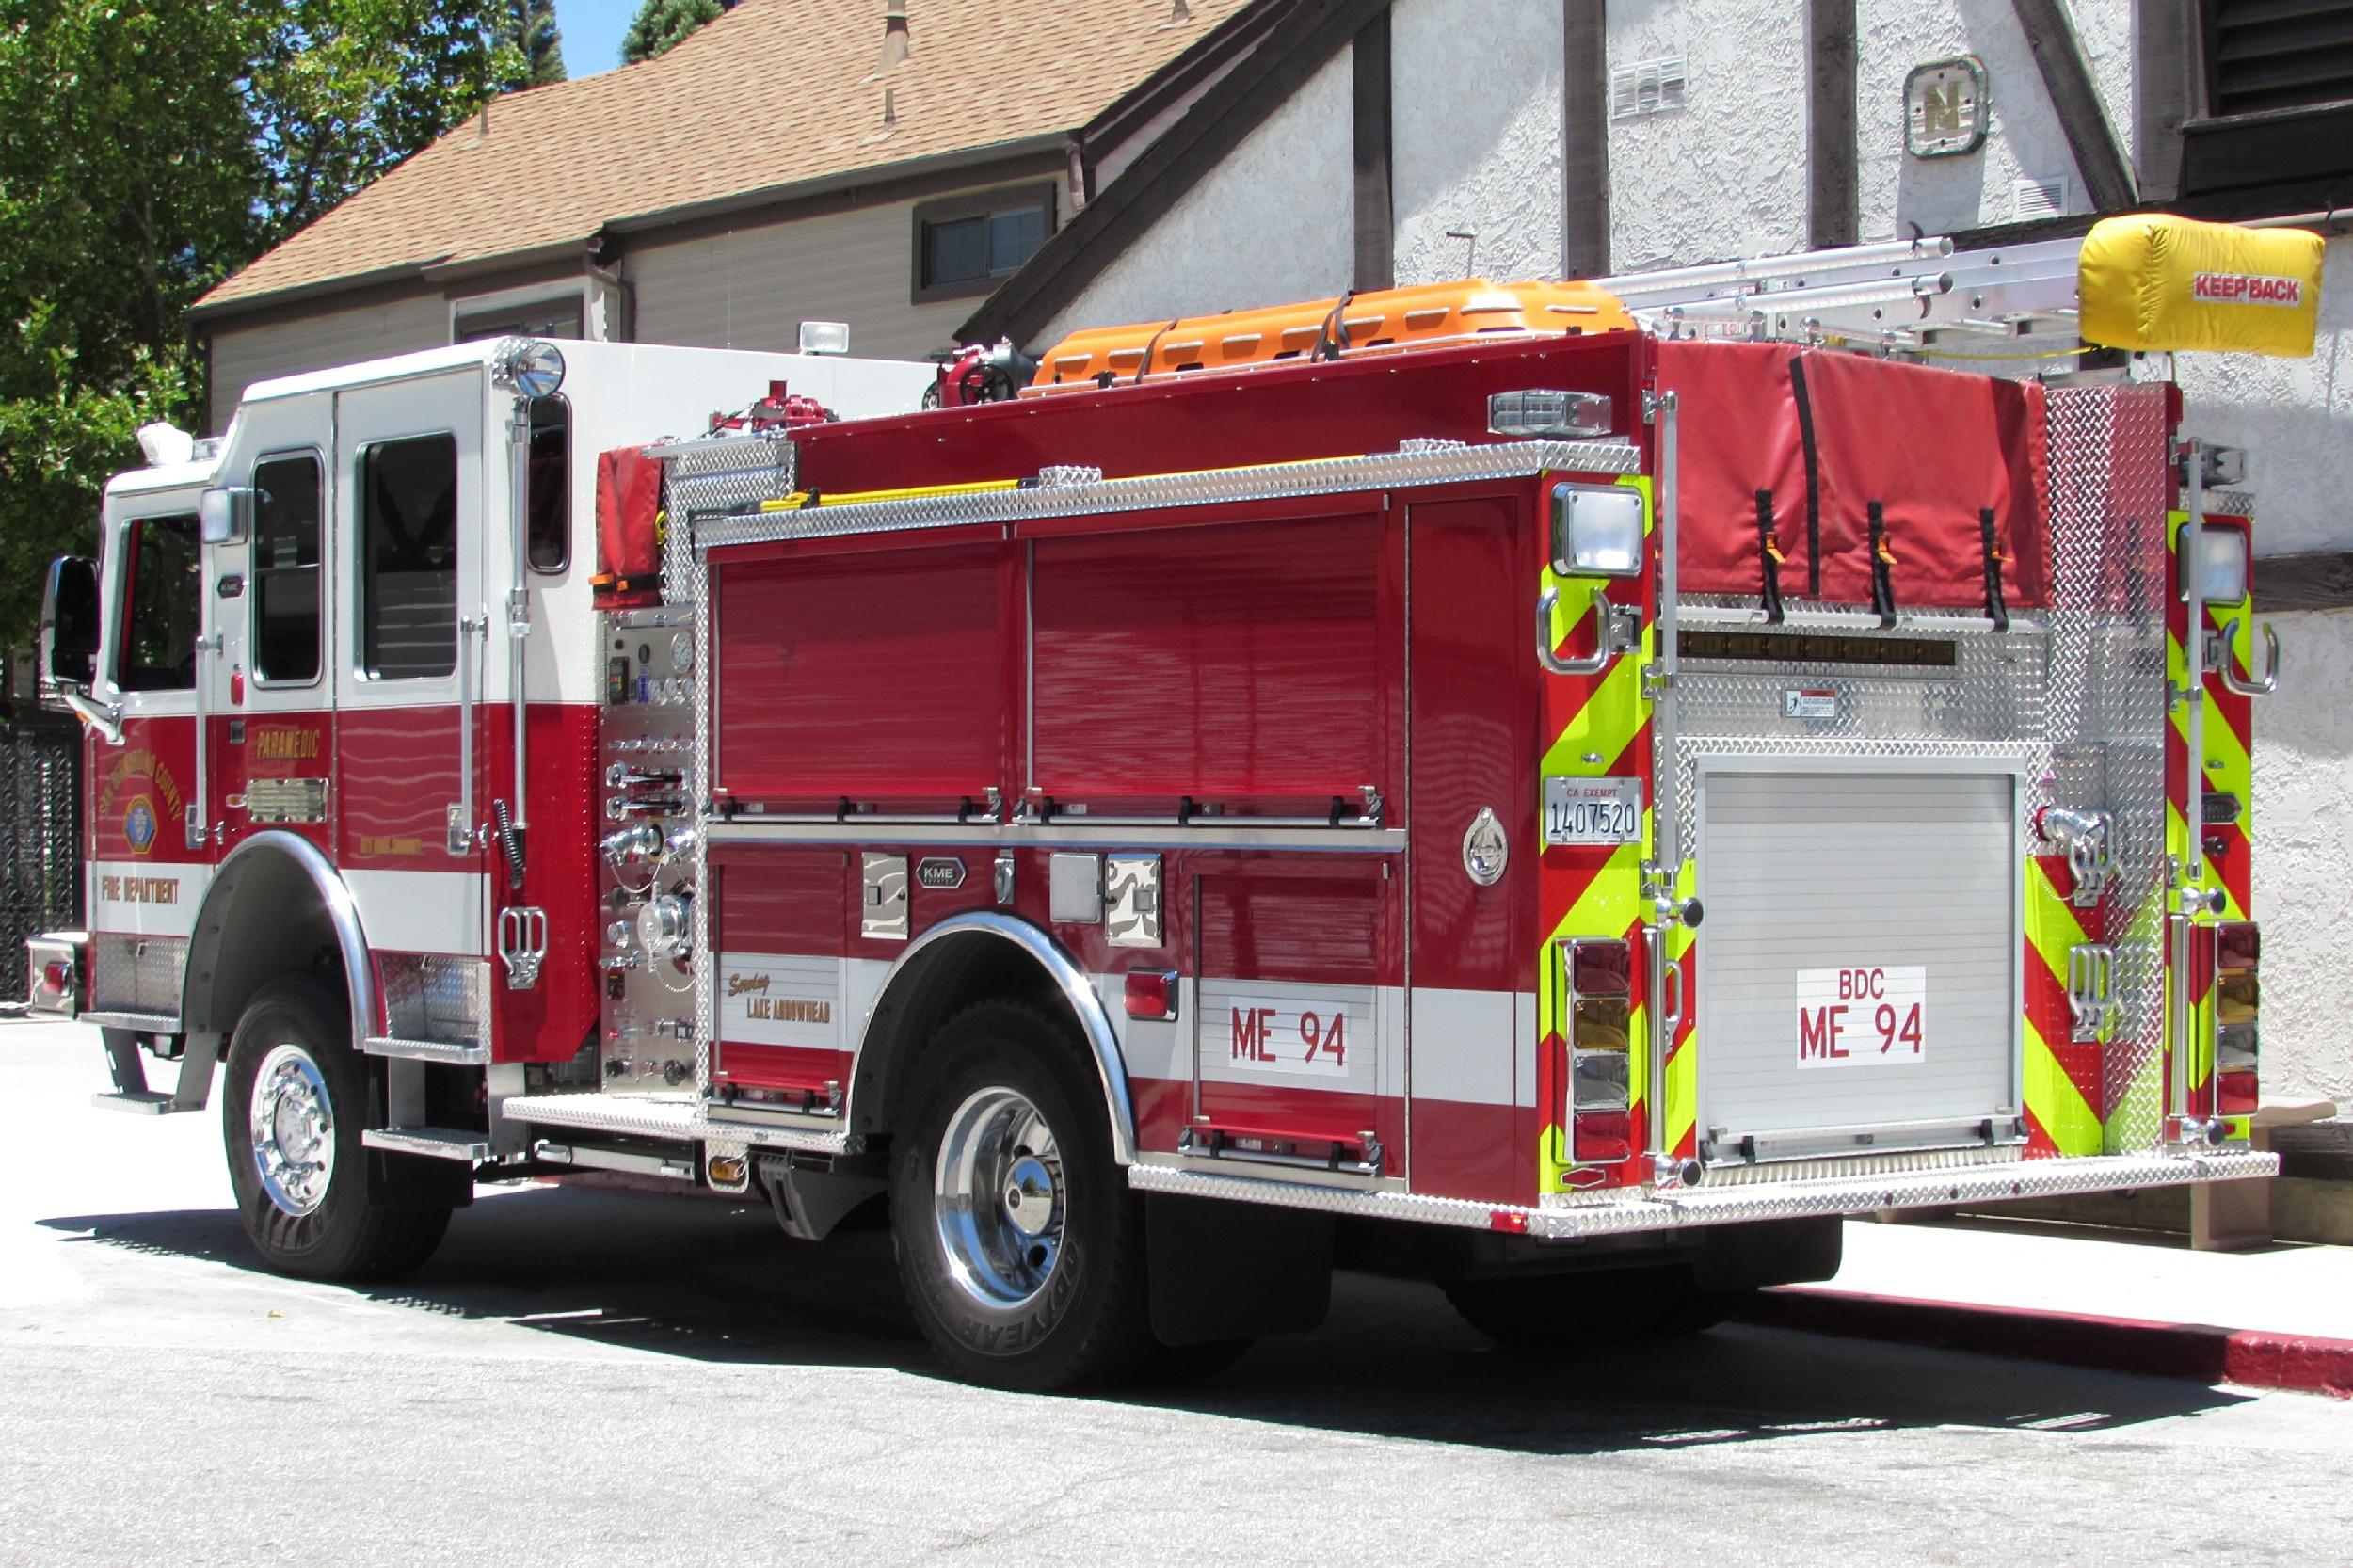 CA, San Bernardino County Fire Department Engine